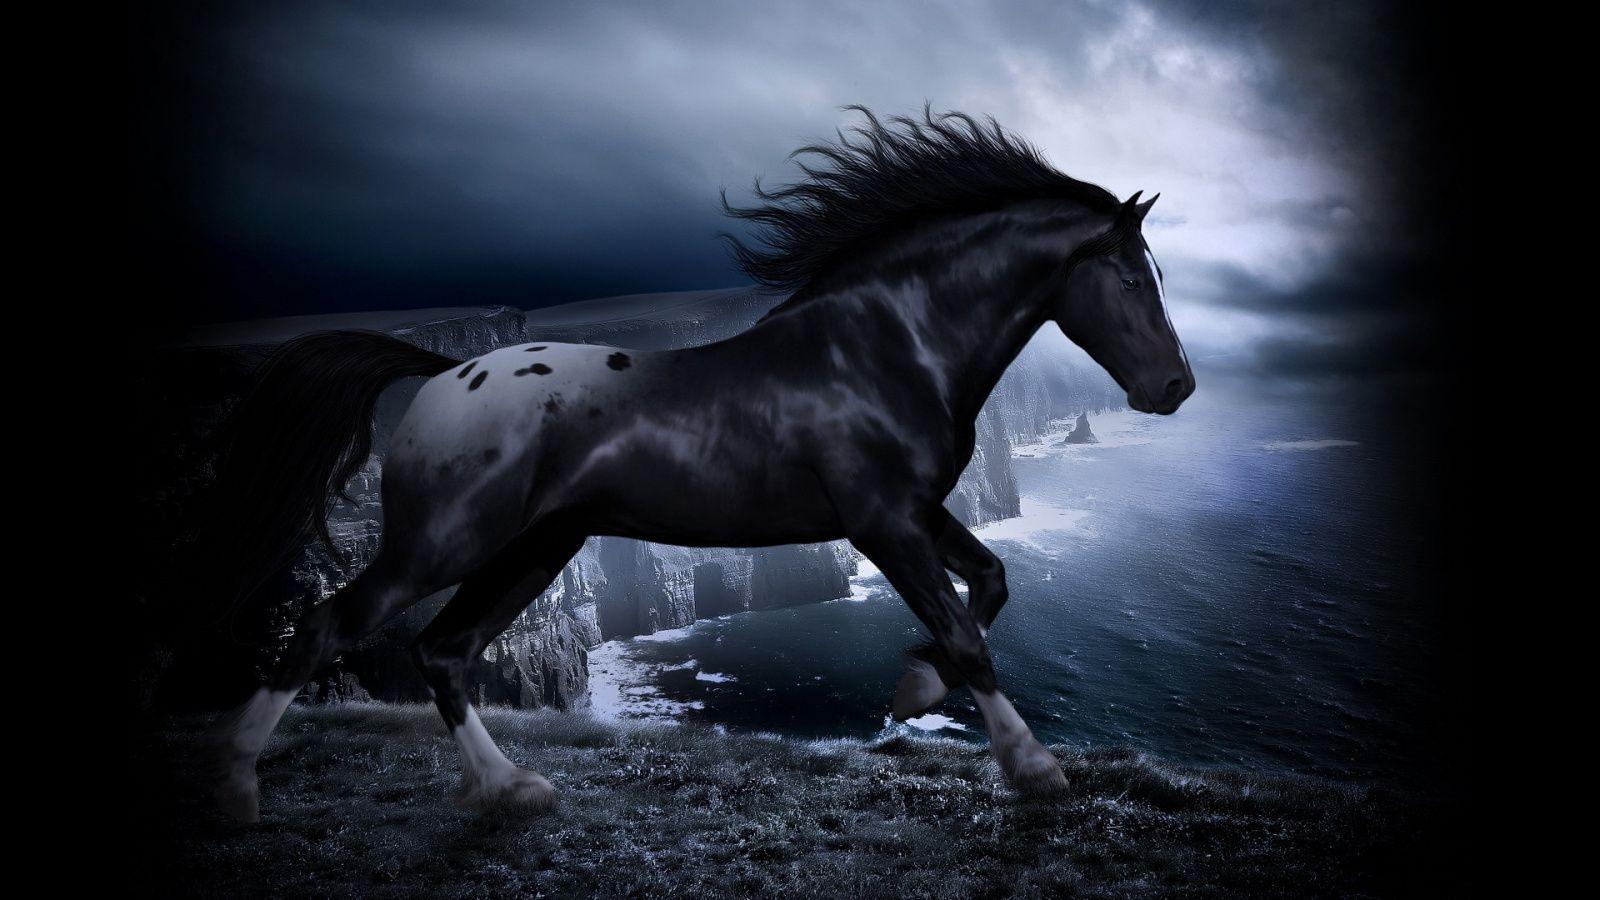 horse iphone wallpaper